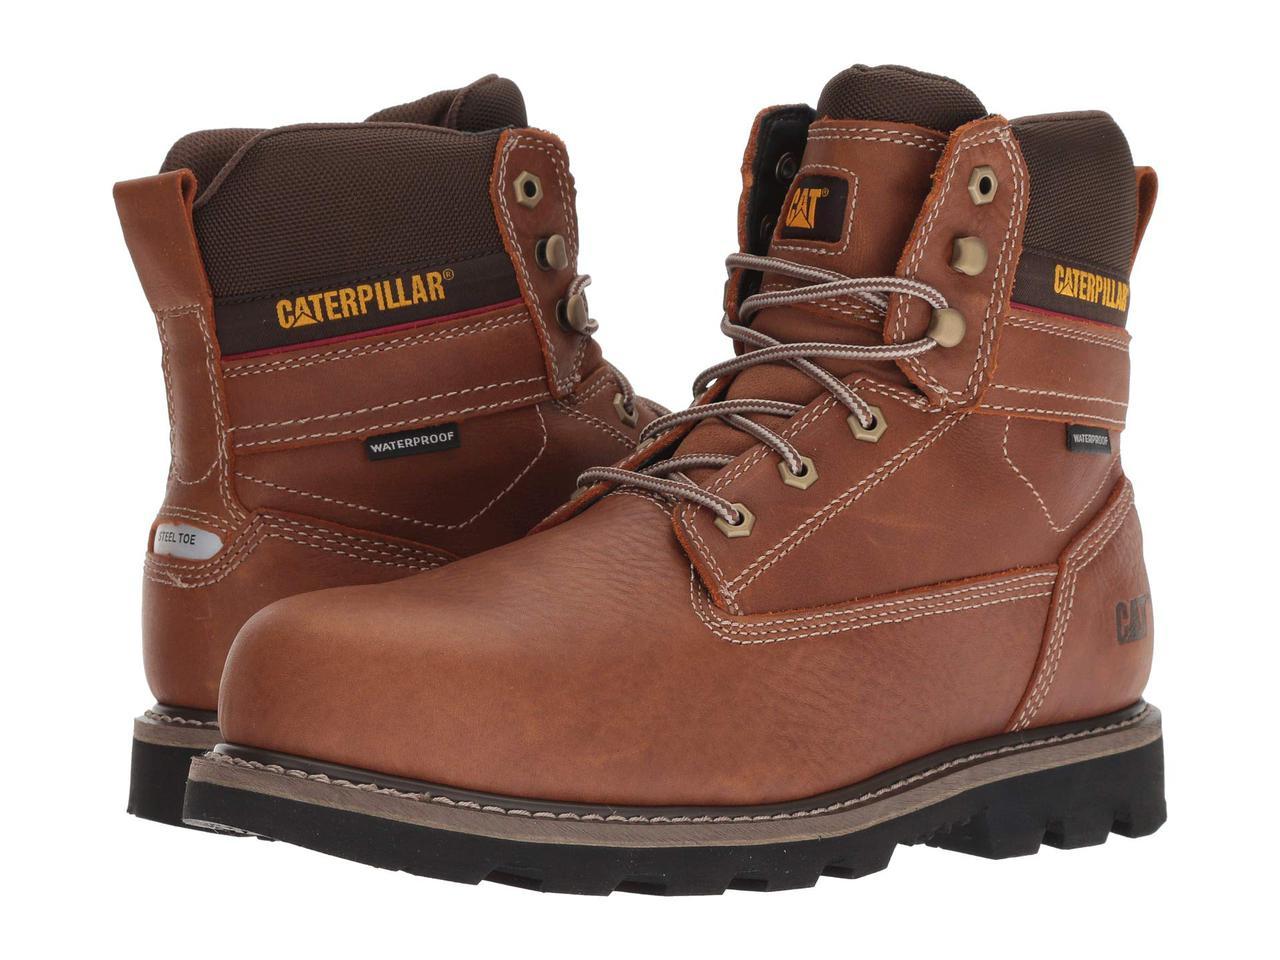 Ботинки/Сапоги (Оригинал) Caterpillar Idaho Steel Toe WP Walnut